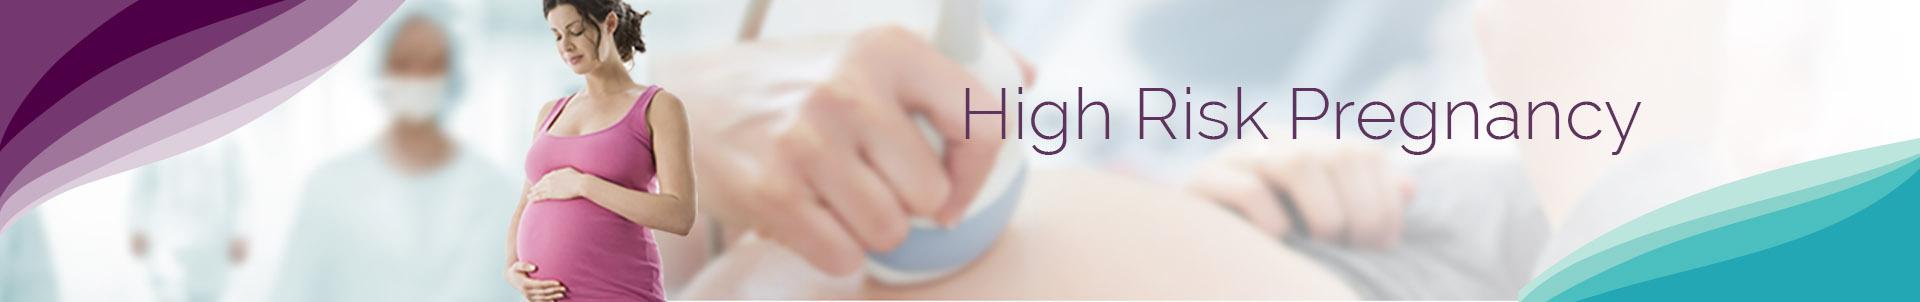 high risk pregnancy